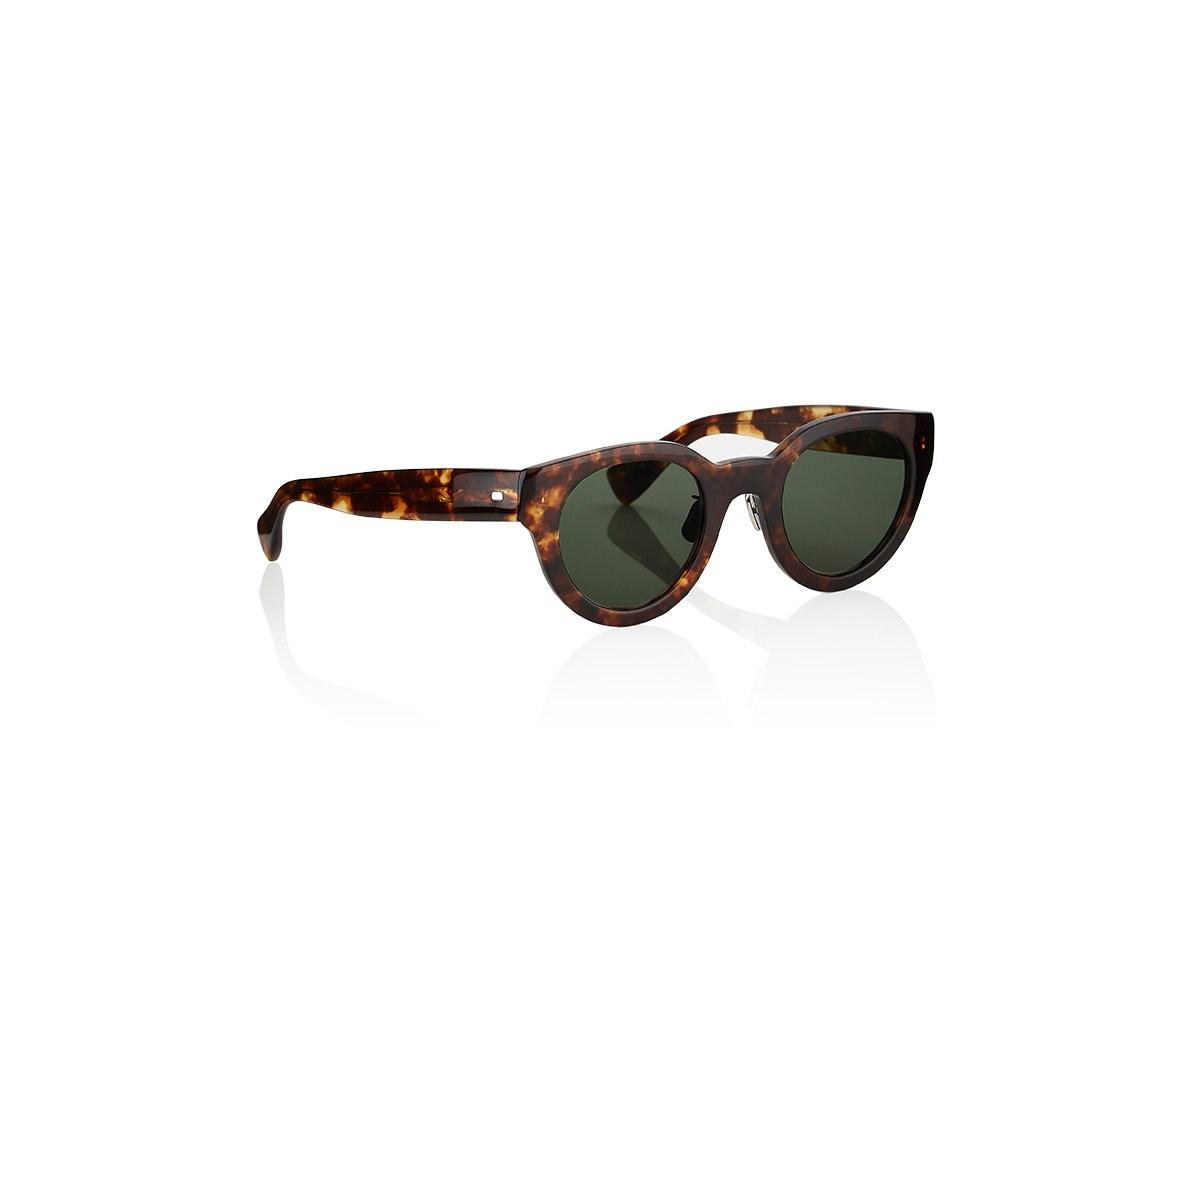 8efd1a2988 Eyevan 7285 - Green Model 754 Sunglasses for Men - Lyst. View fullscreen